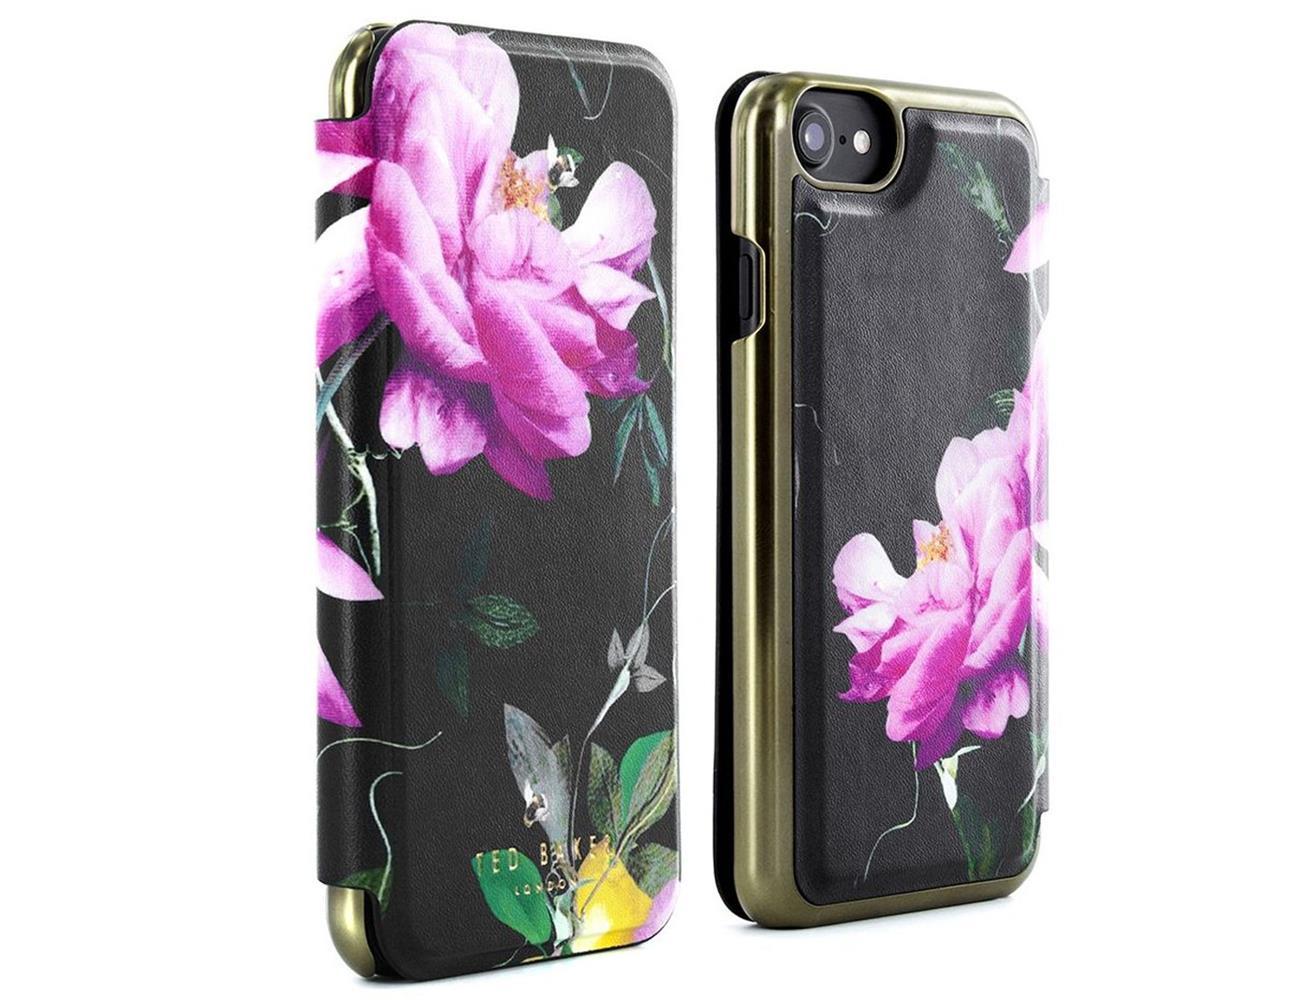 3ddd53f9863c6 Proporta PRO-41816 iPhone 7 Ted Baker Mirror Case - Bloom Black ...